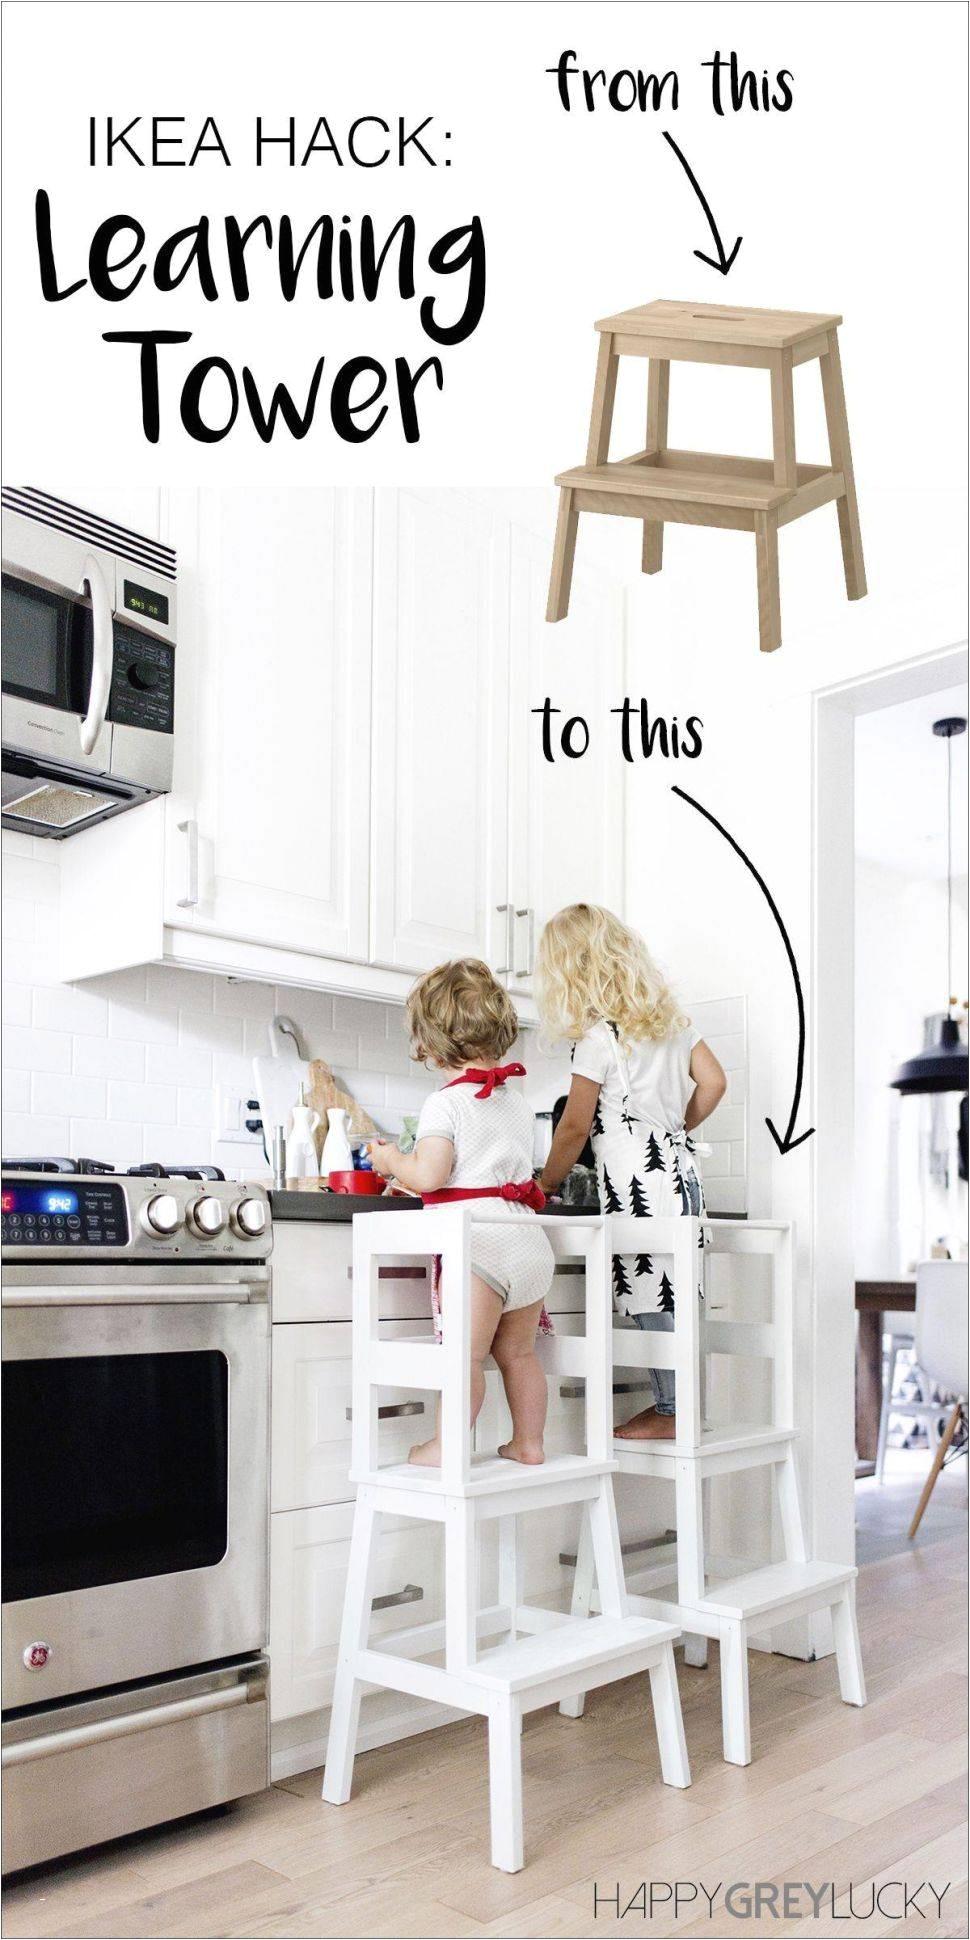 Ikea Teenage Chairs Swing Chairs for Bedrooms Ikea Luxury Bedroom Ideas Ikea Kids Rooms